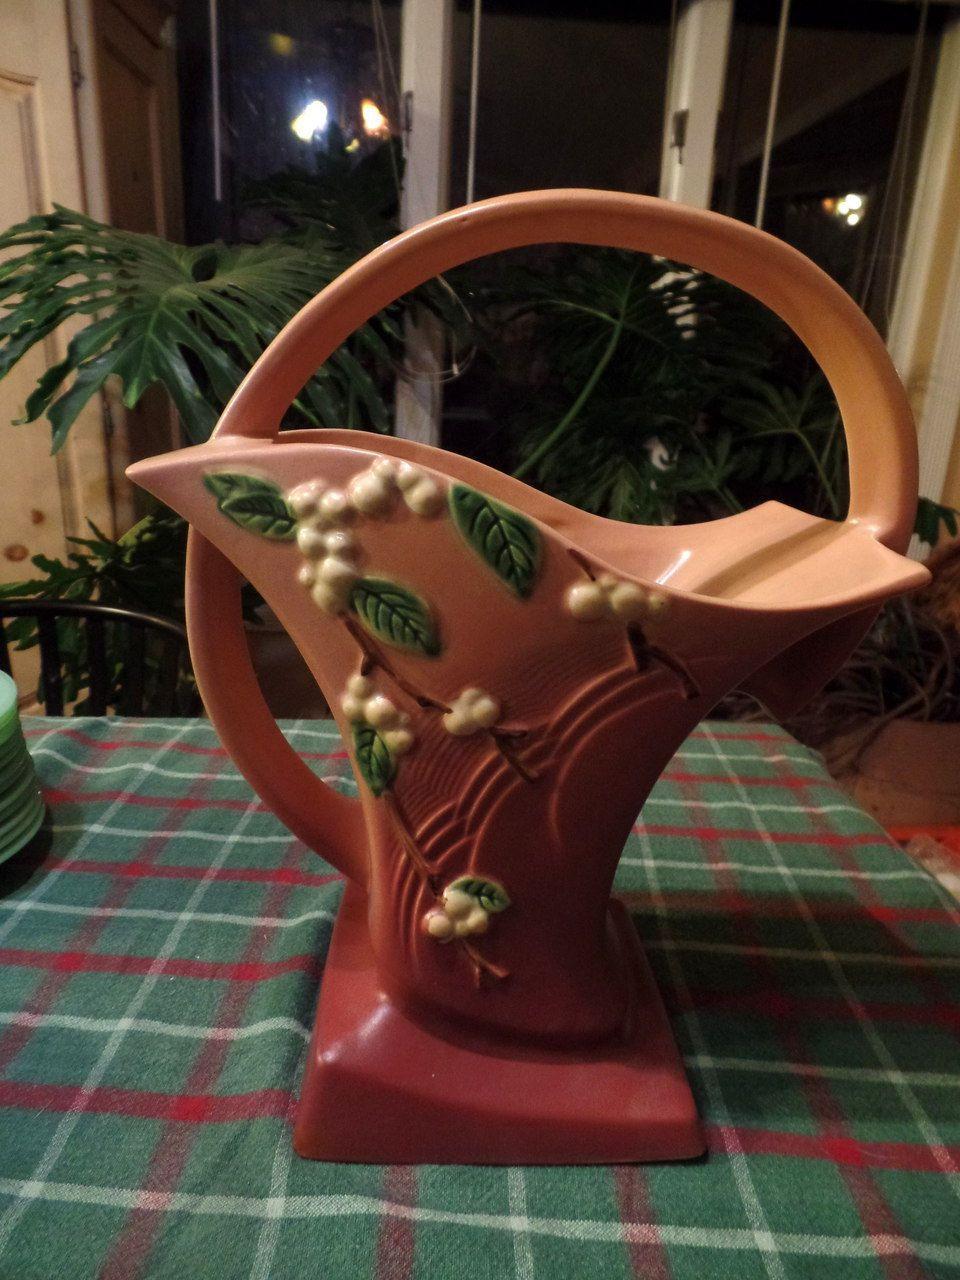 at home store vases of roseville basket vase 1940s snowberry 13 pink snowberry 1940s 13 throughout roseville basket vase 1940s snowberry 13 pink snowberry 1940s 13 tall home decor store home decor patio and garden store